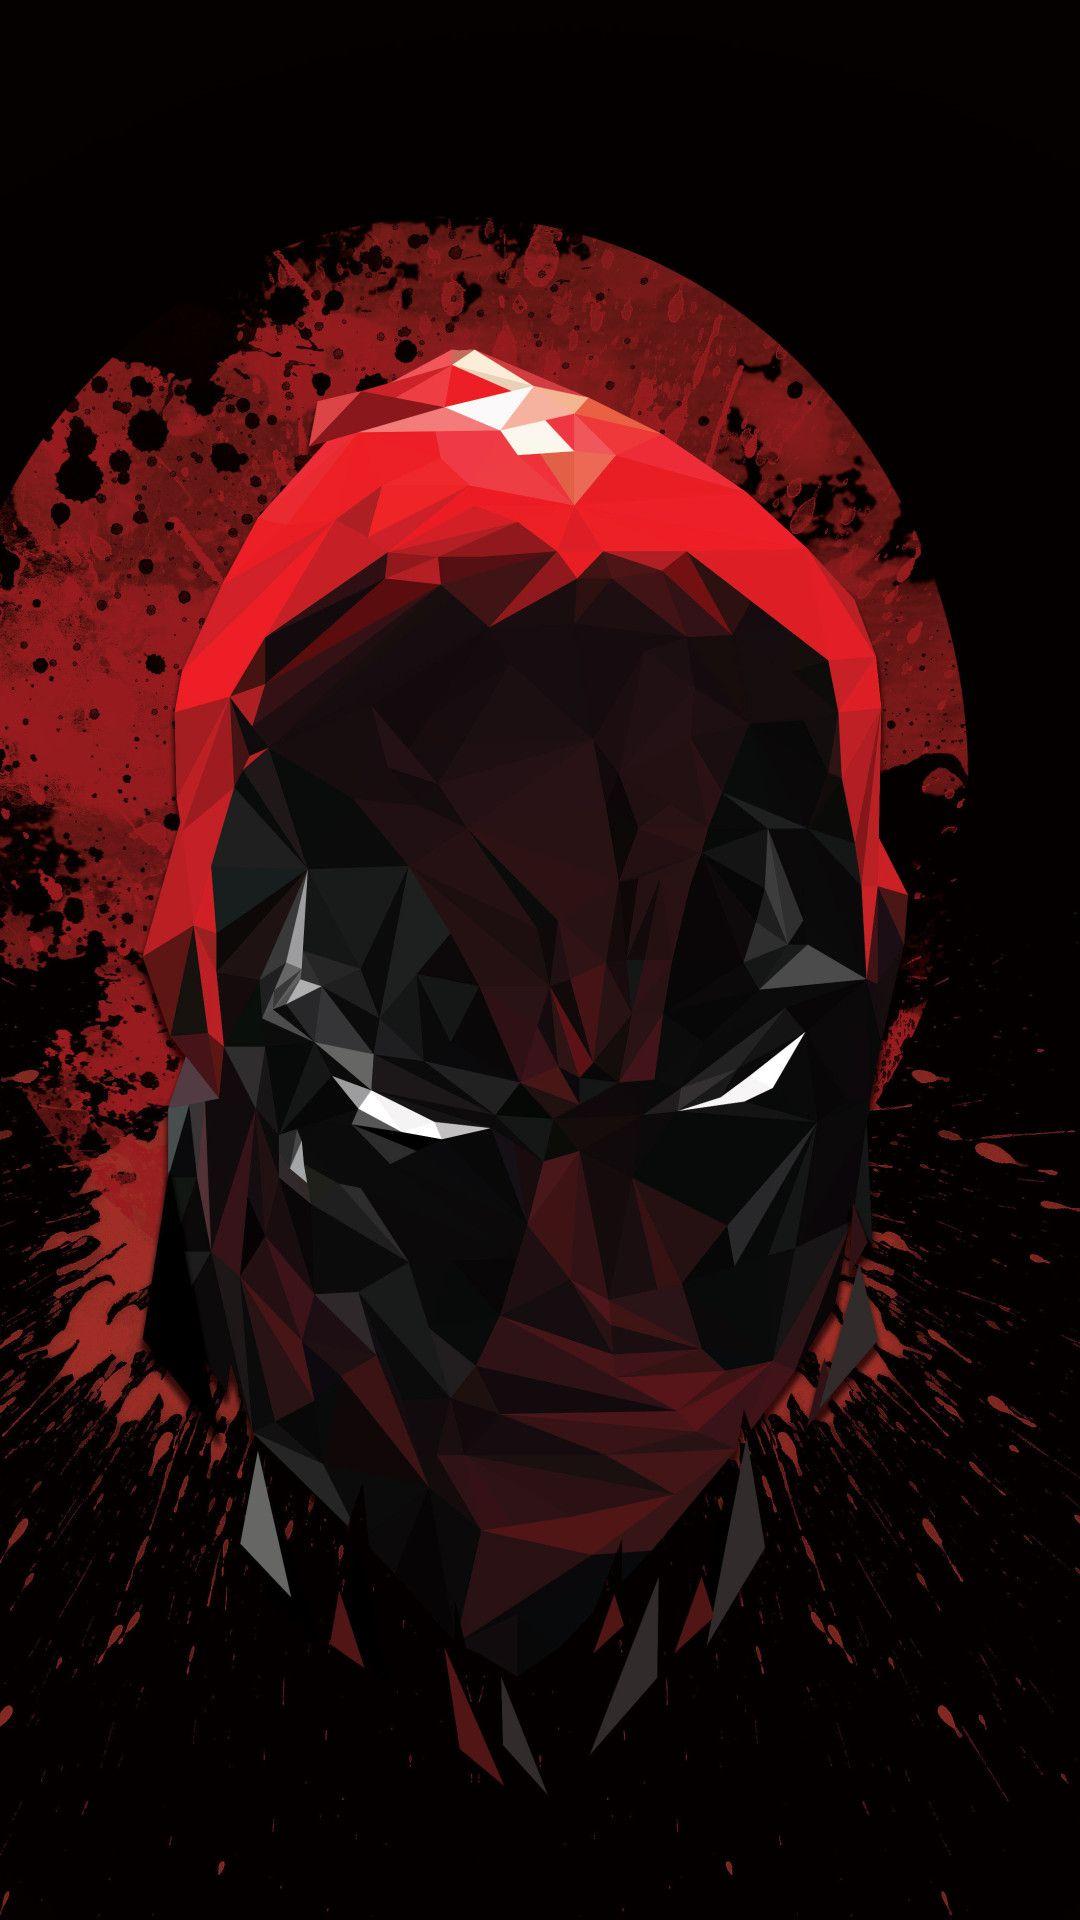 Deadpool Low Poly Artwork 4k Mobile Wallpaper (iPhone